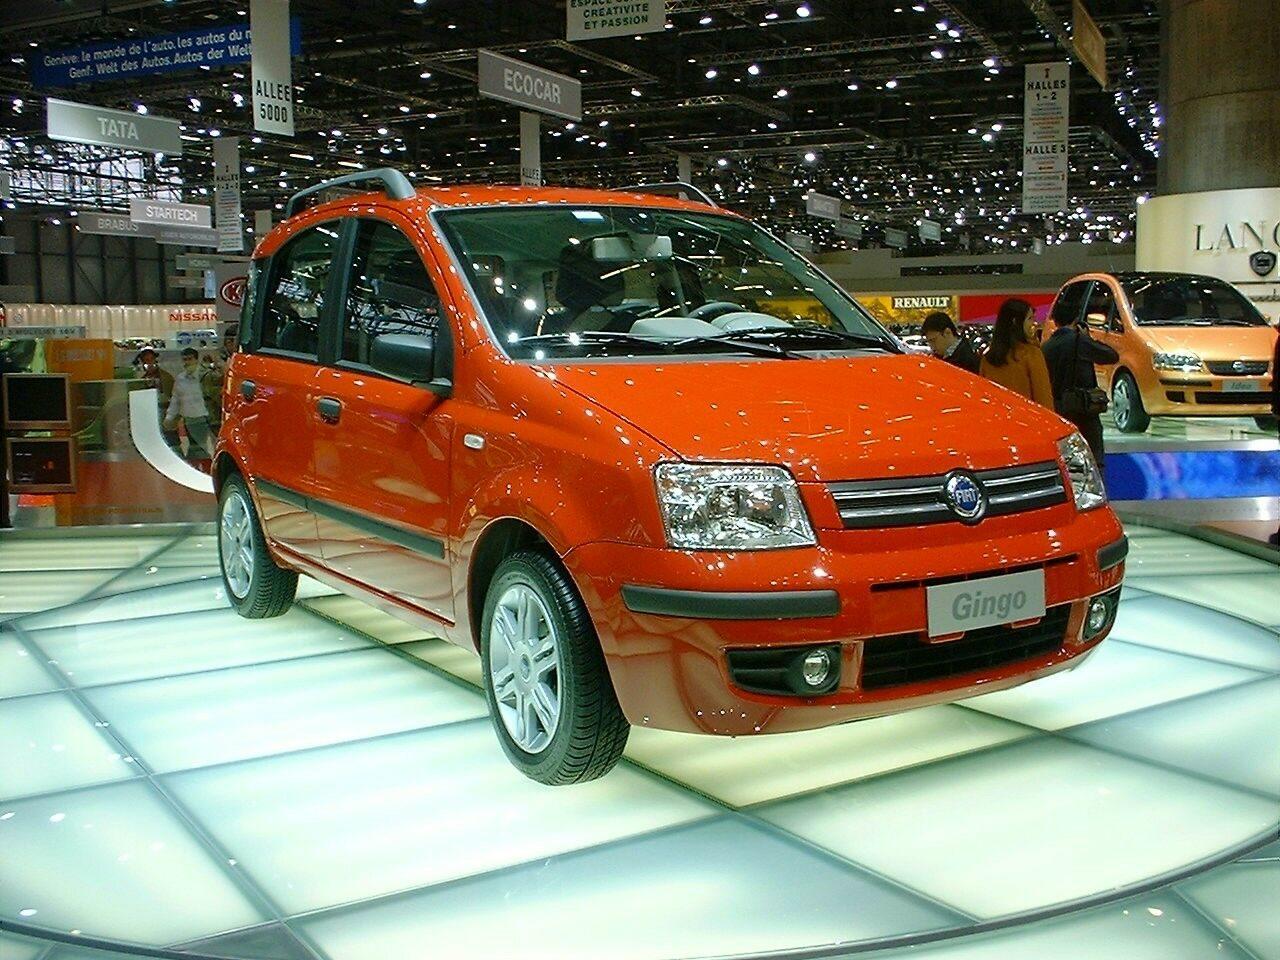 Fiat Gingo Genebra 2003